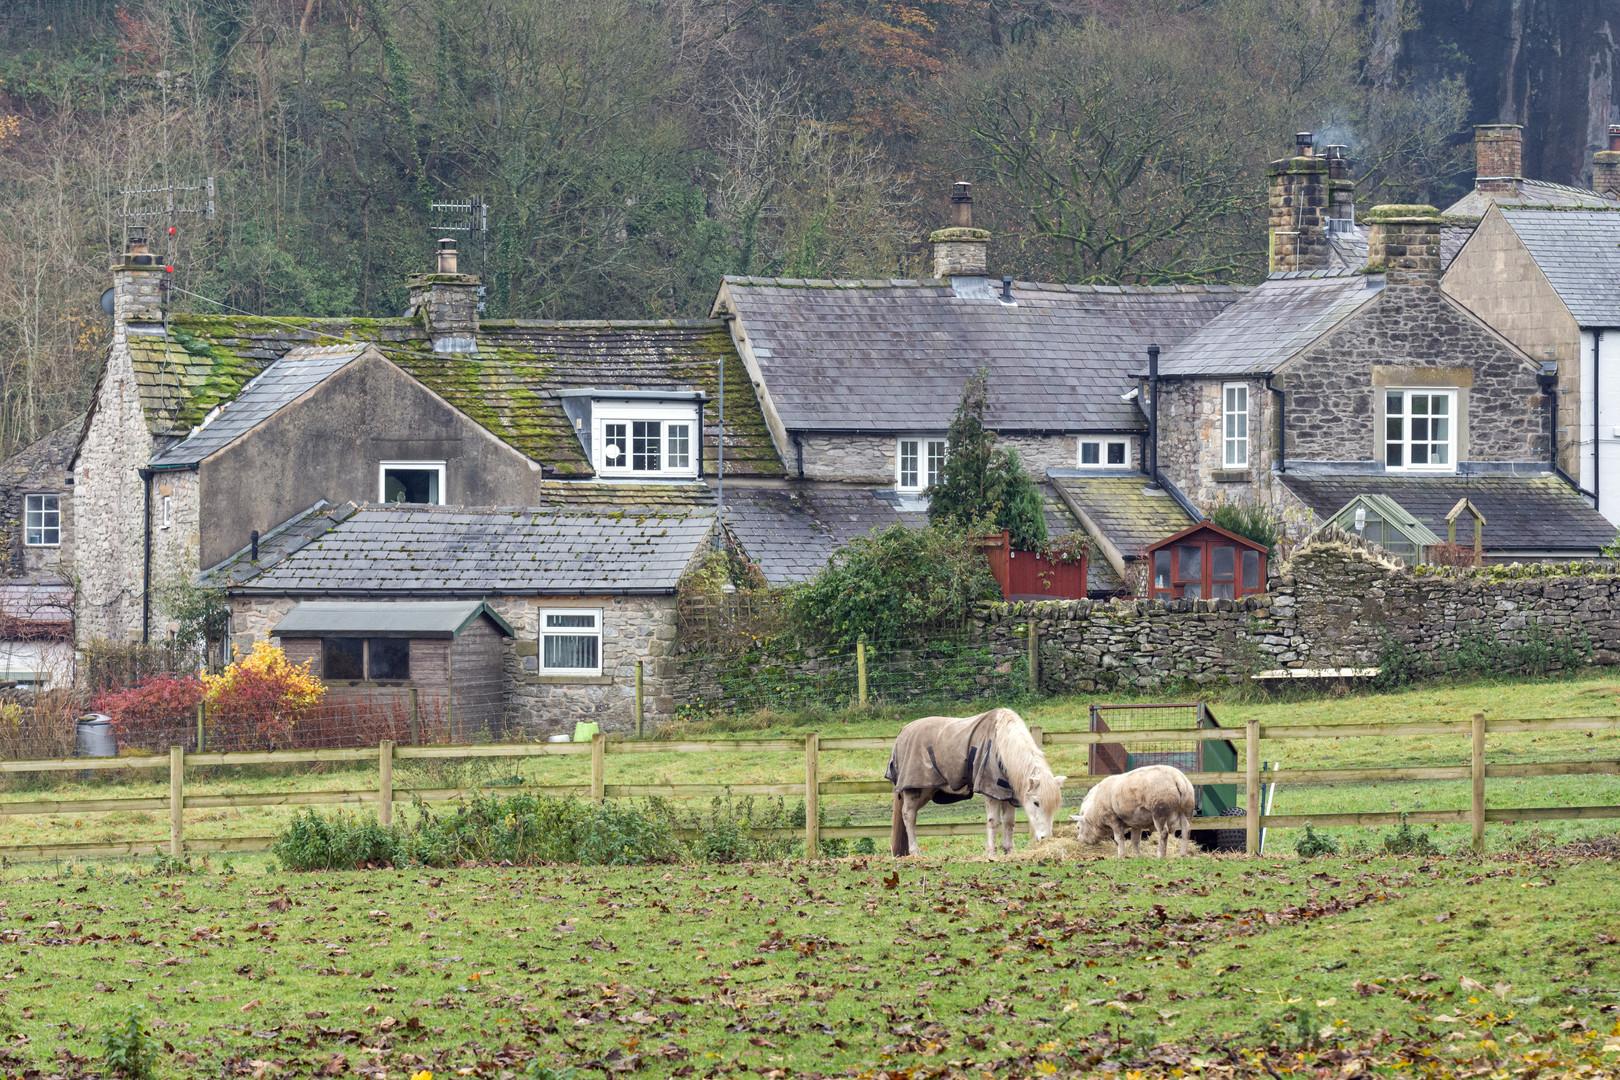 Scene from Castleton, Peak District, England